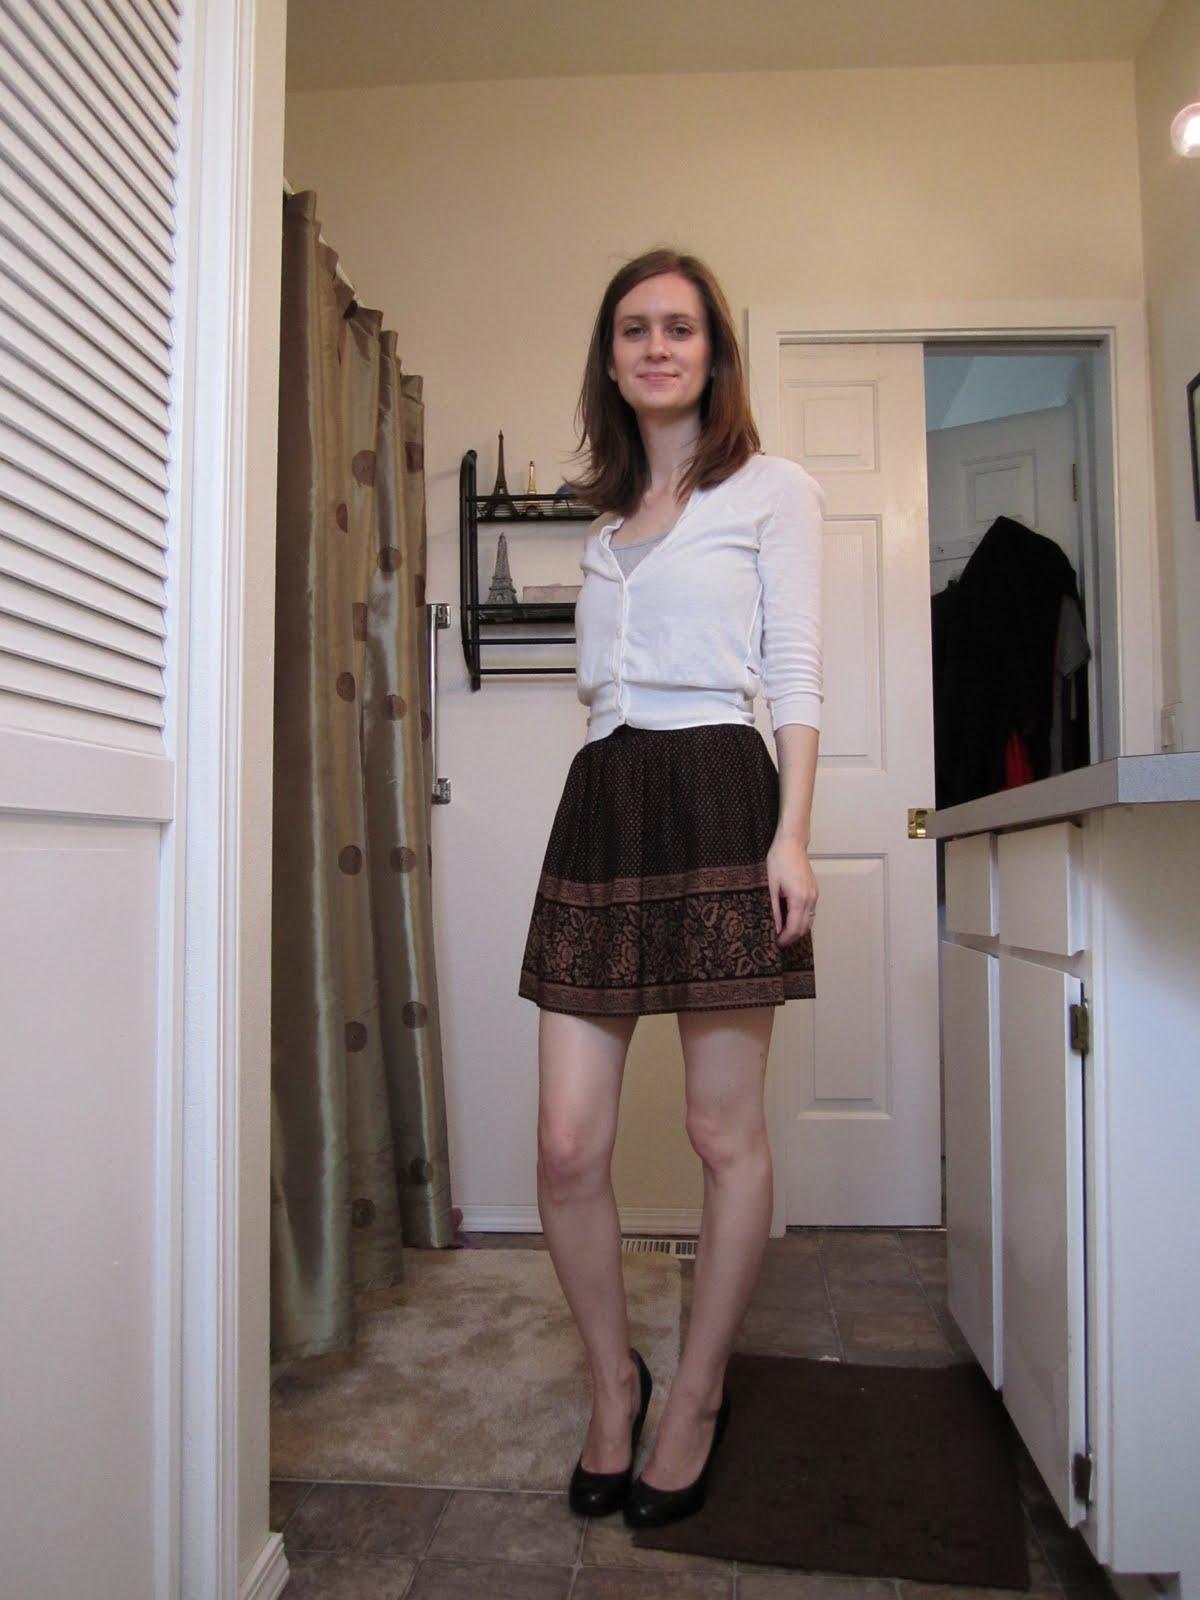 Can my wife wear a mini skirt?